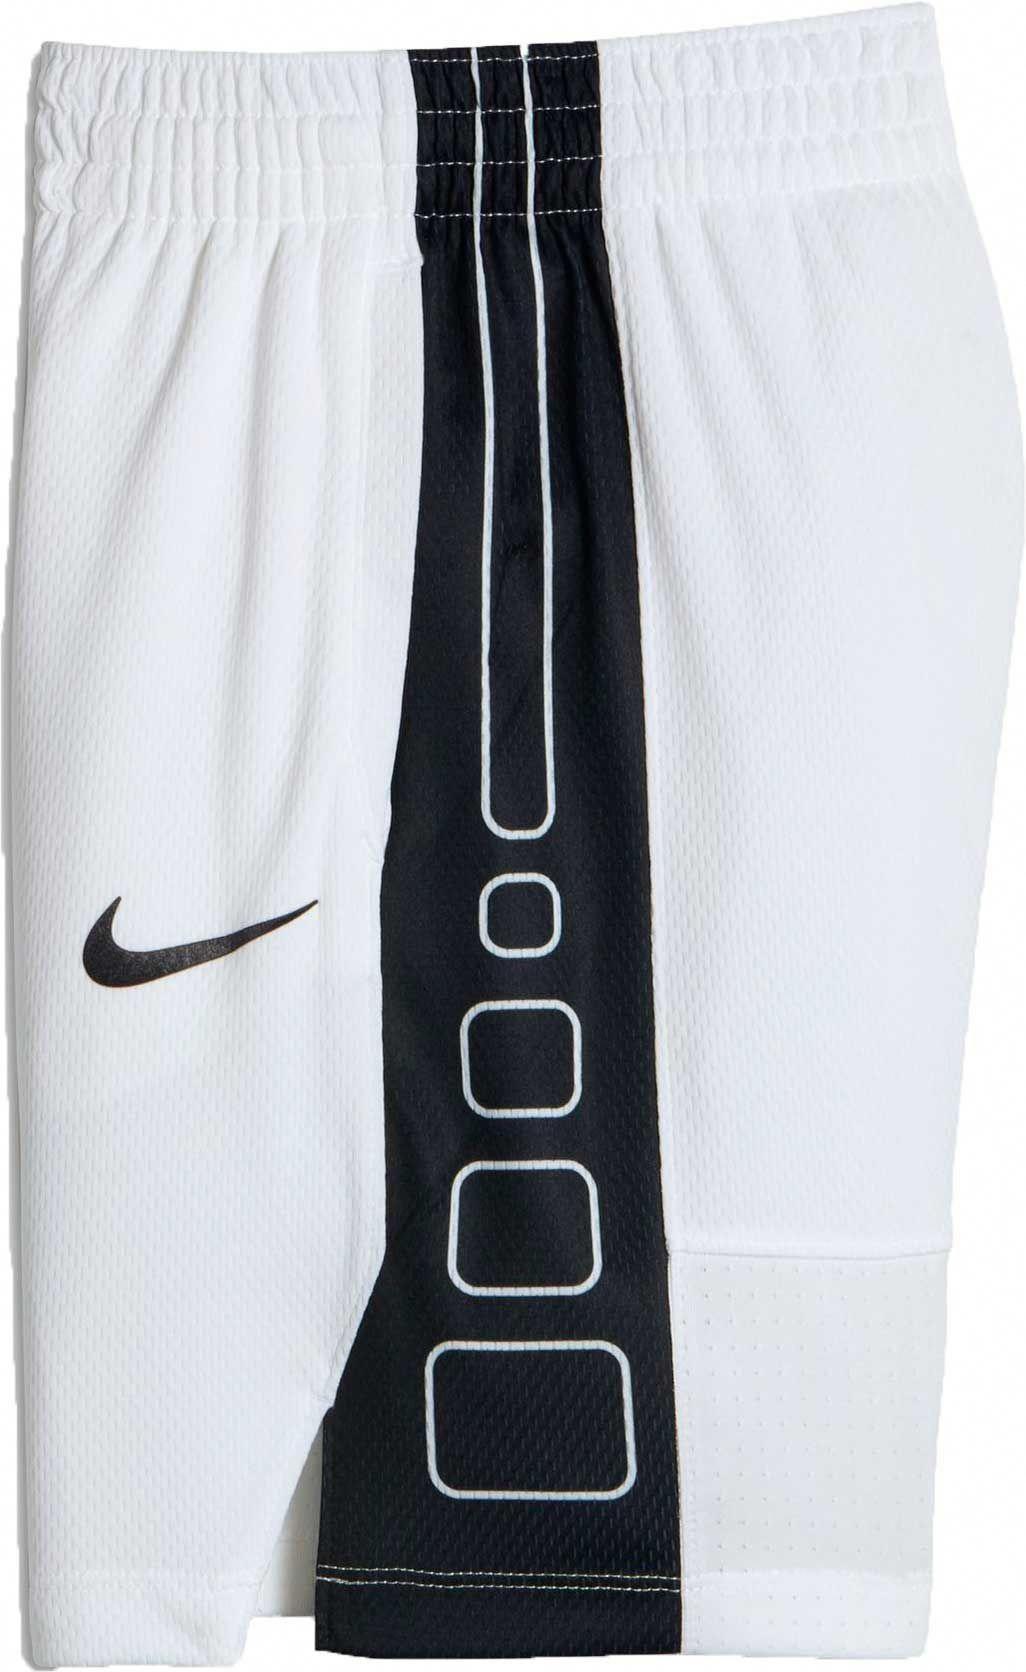 2074f91052 Nike Girls' Dry Elite Stripe Basketball Shorts, Size: XS, White  #AdidasBasketballShoes